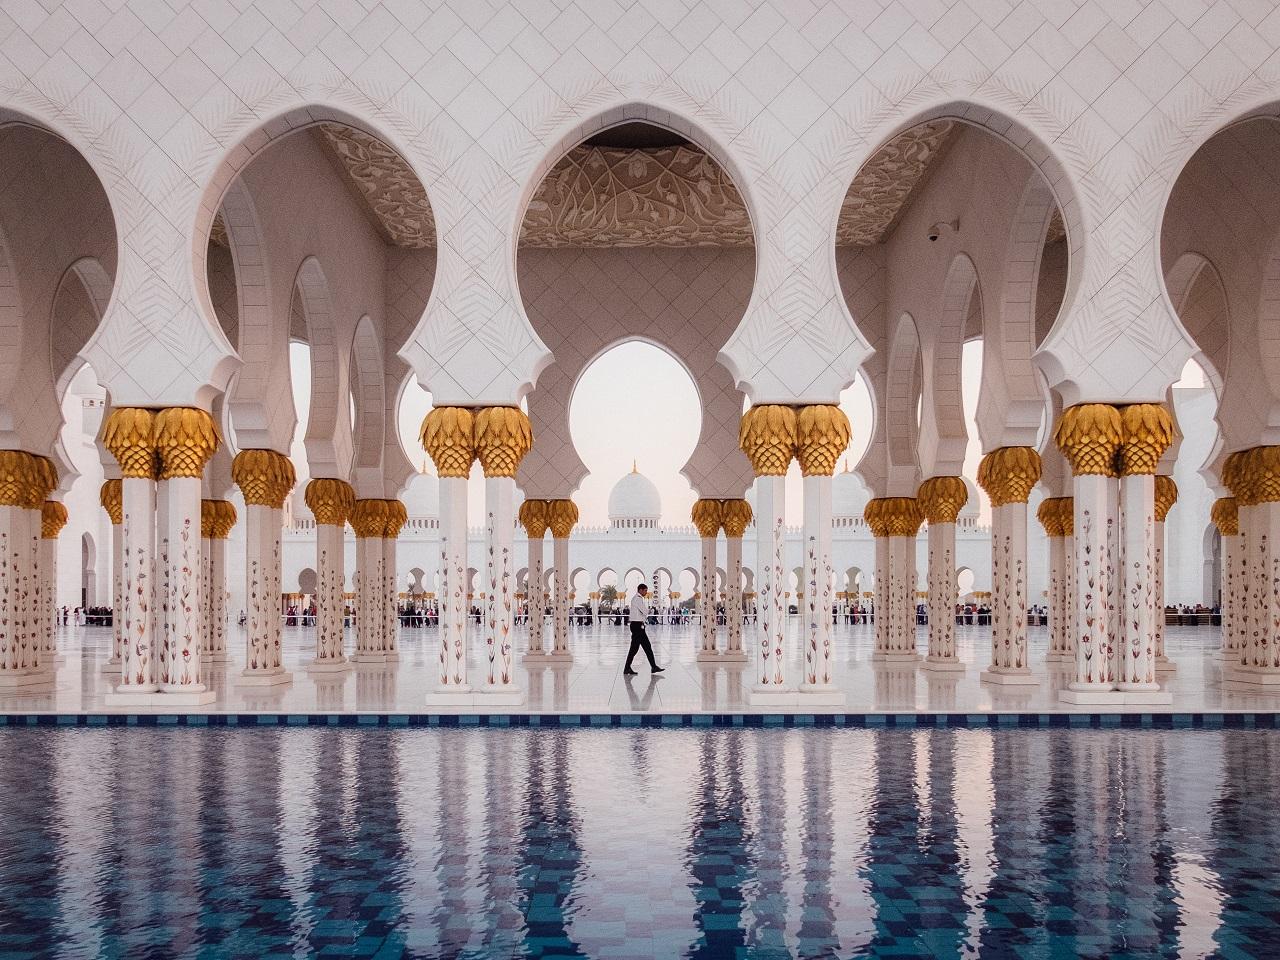 Utazómajom   Bakancslistára való Abu Dhabi hófehér